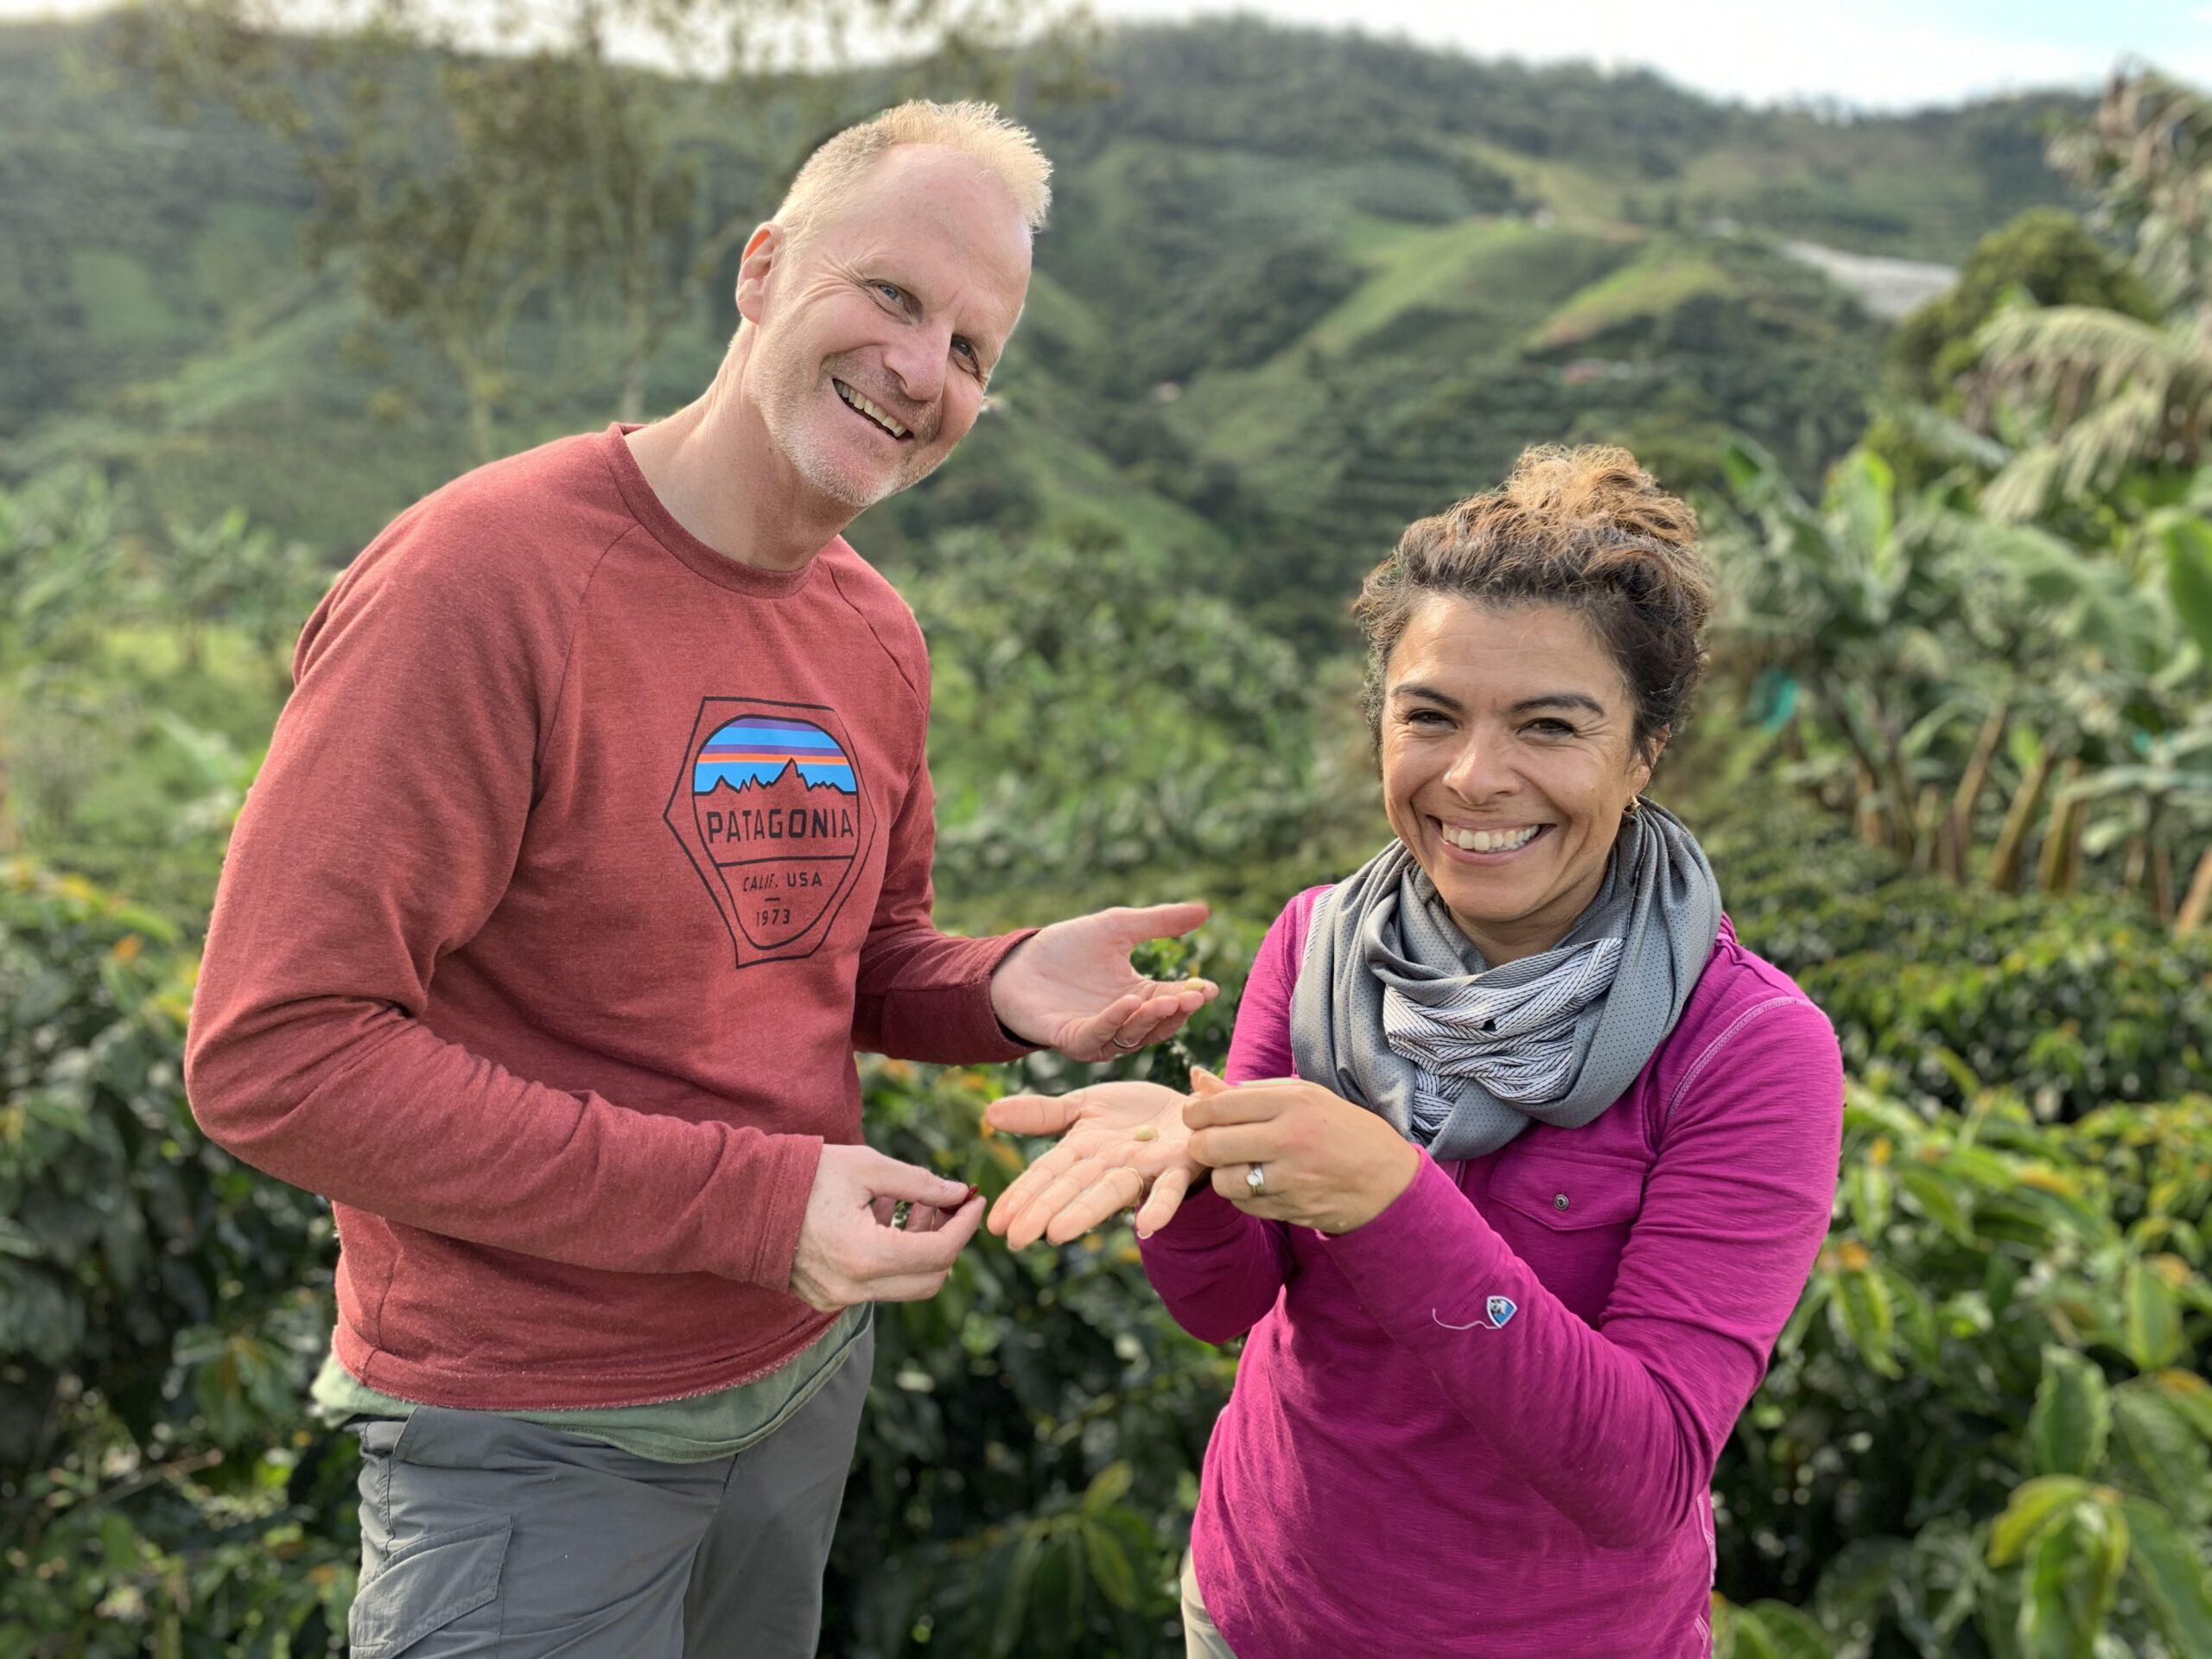 Owners of Finca Mariposa in Jardin, Colombia